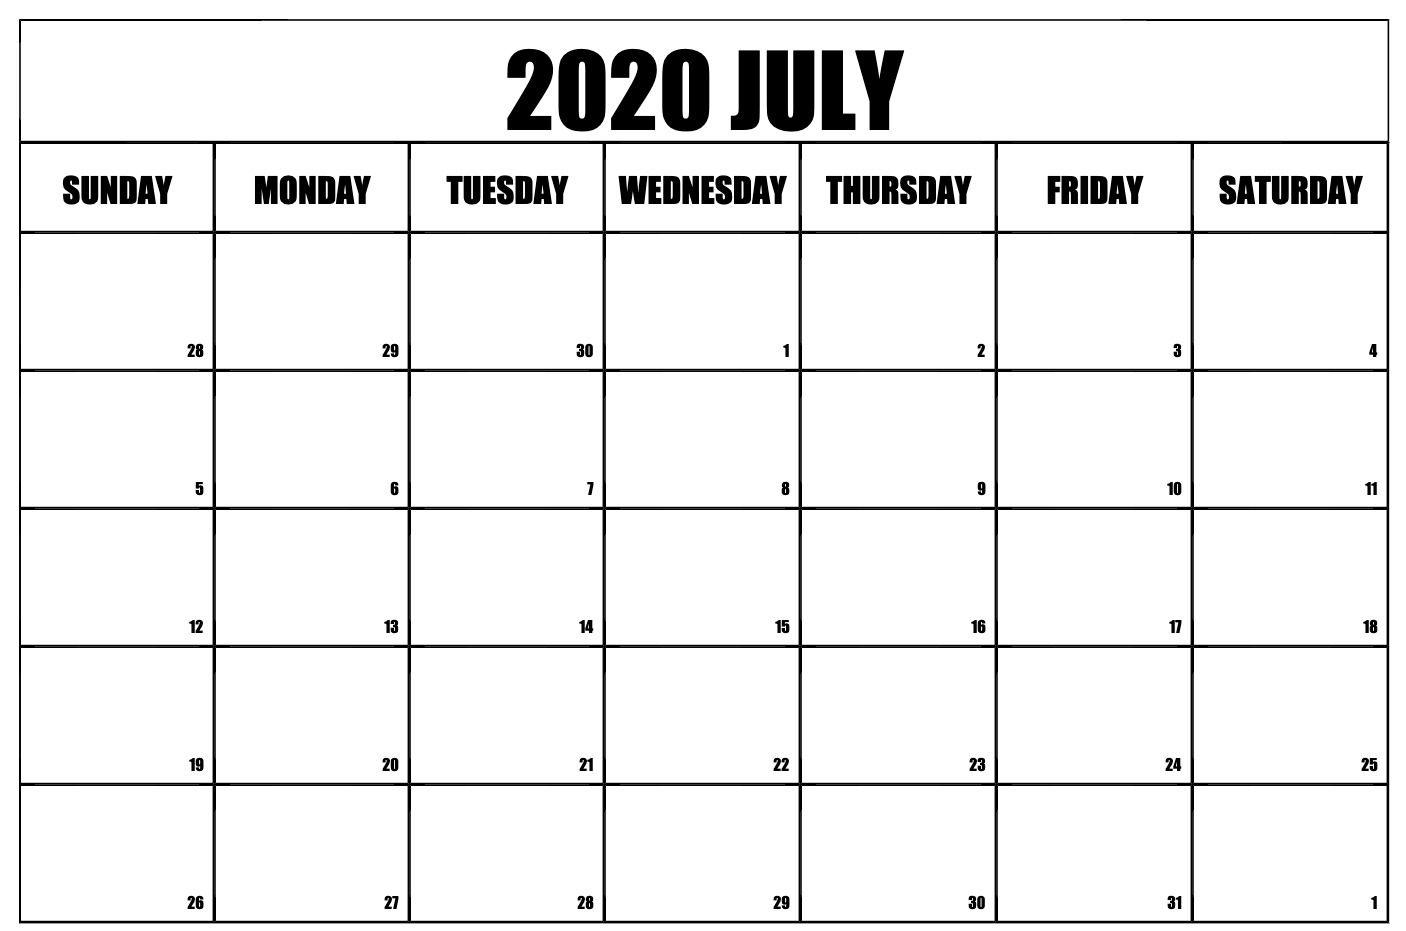 Free Printable July 2020 Calendar | Free Printable Calendar